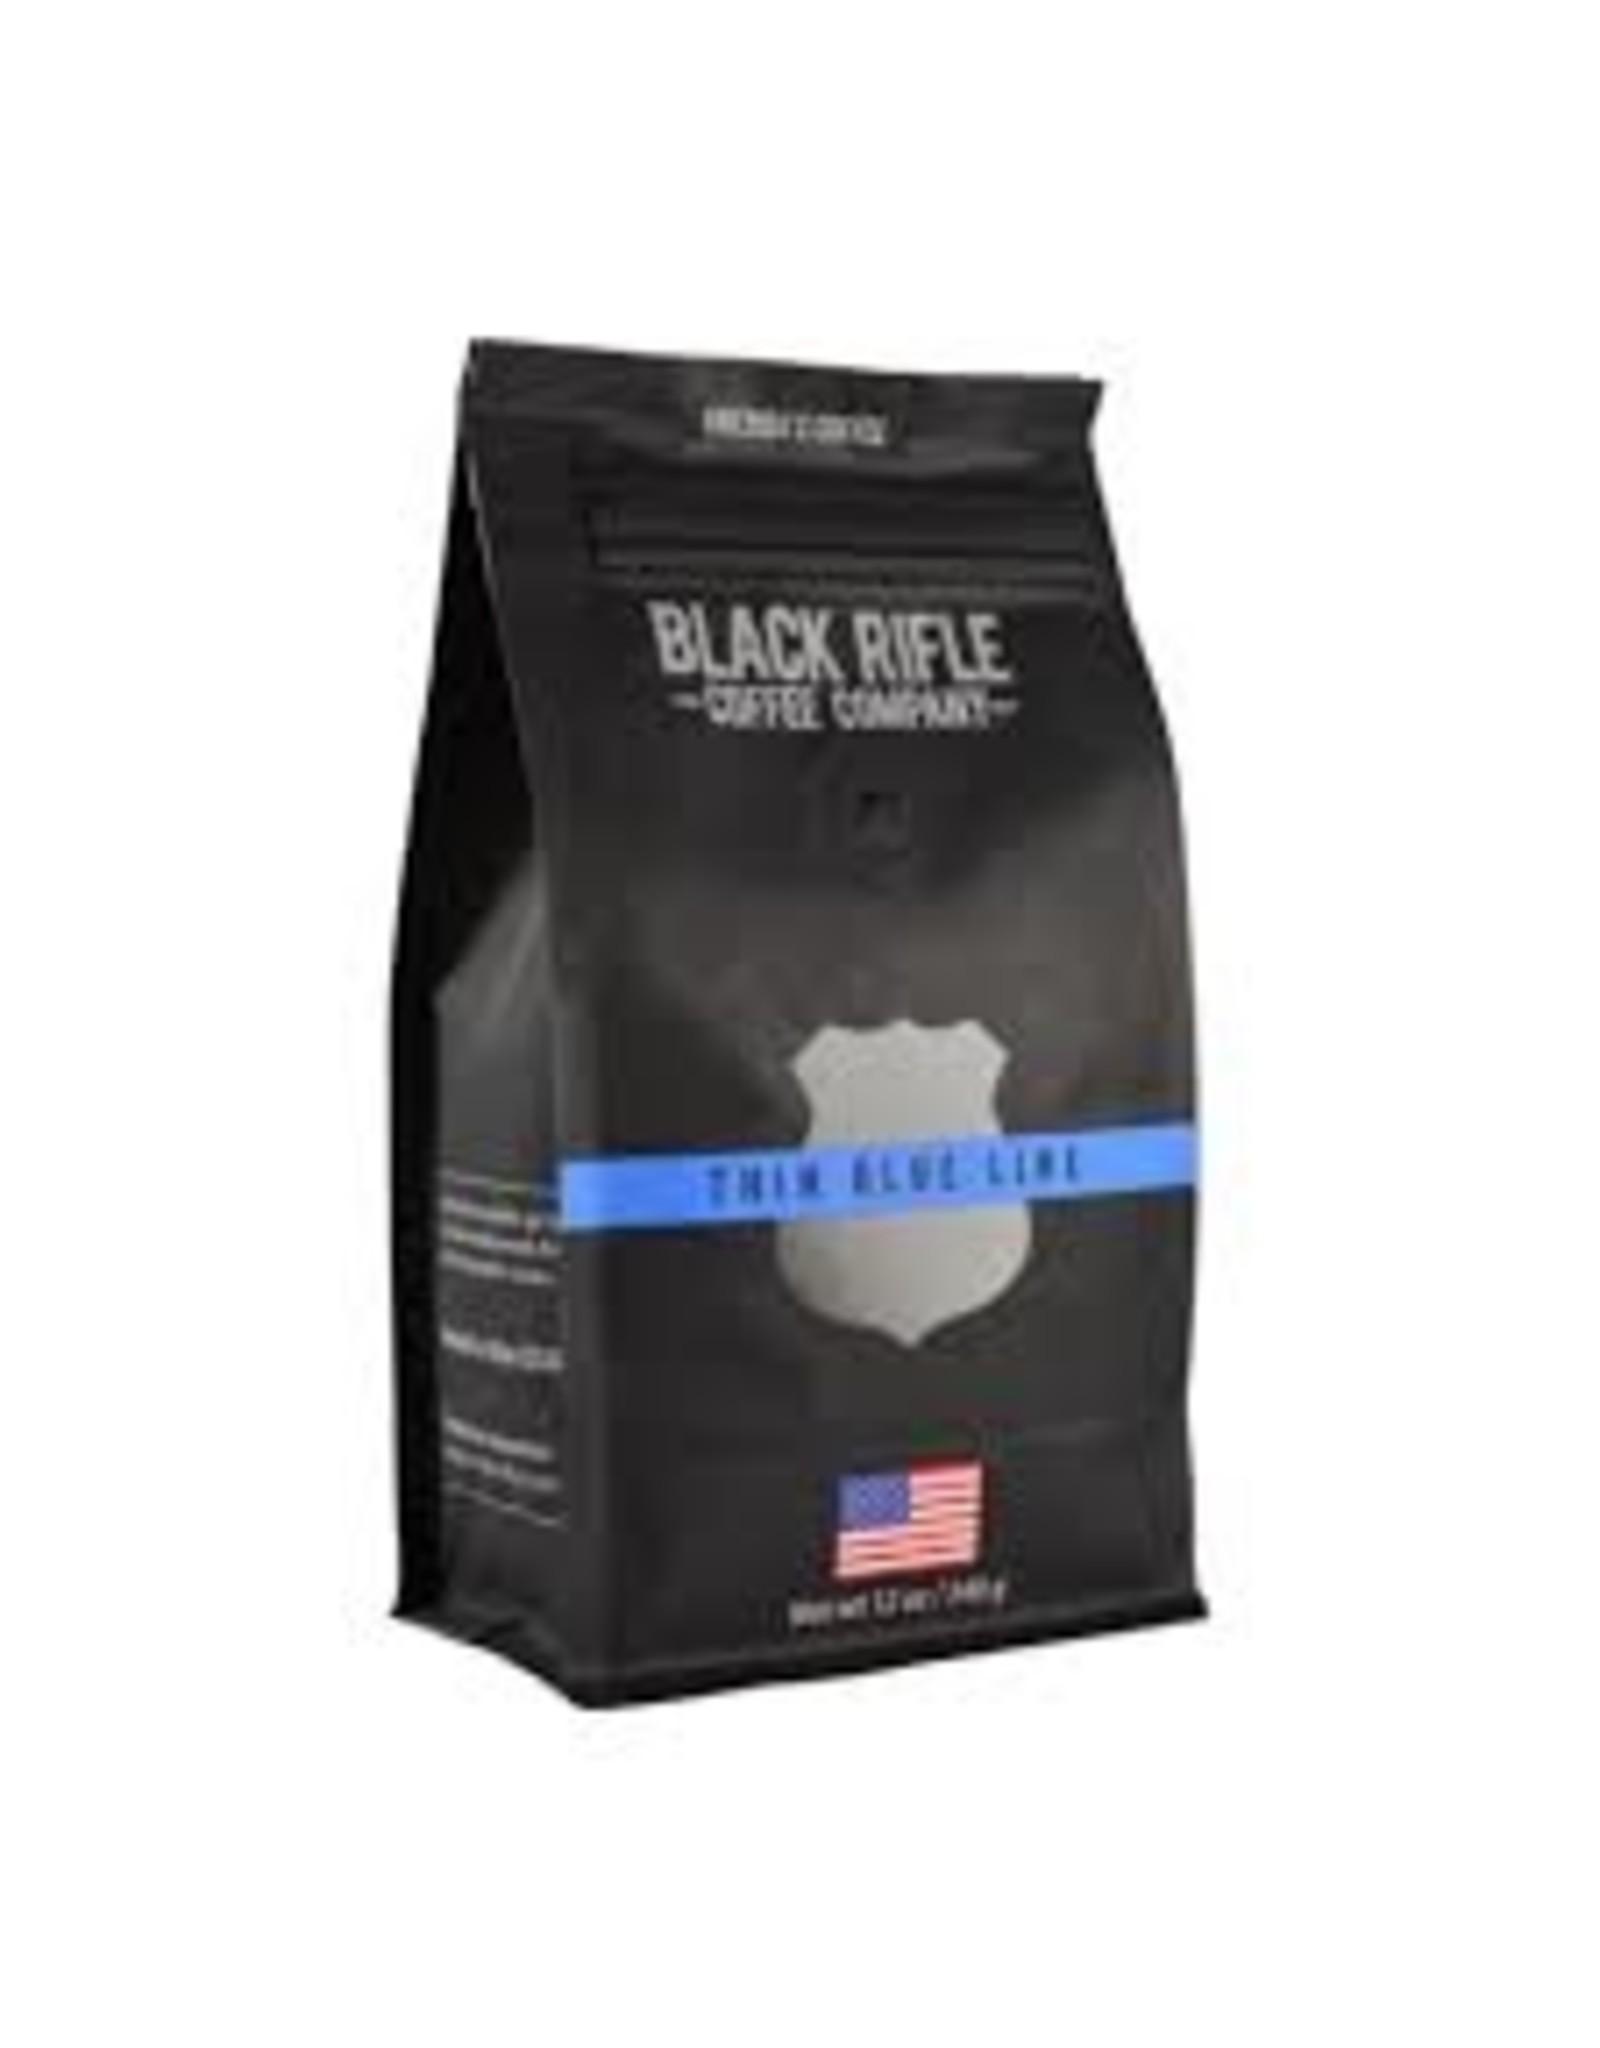 Black Rifle Coffee BRCC - Thin Blue Line - Grounds 12oz